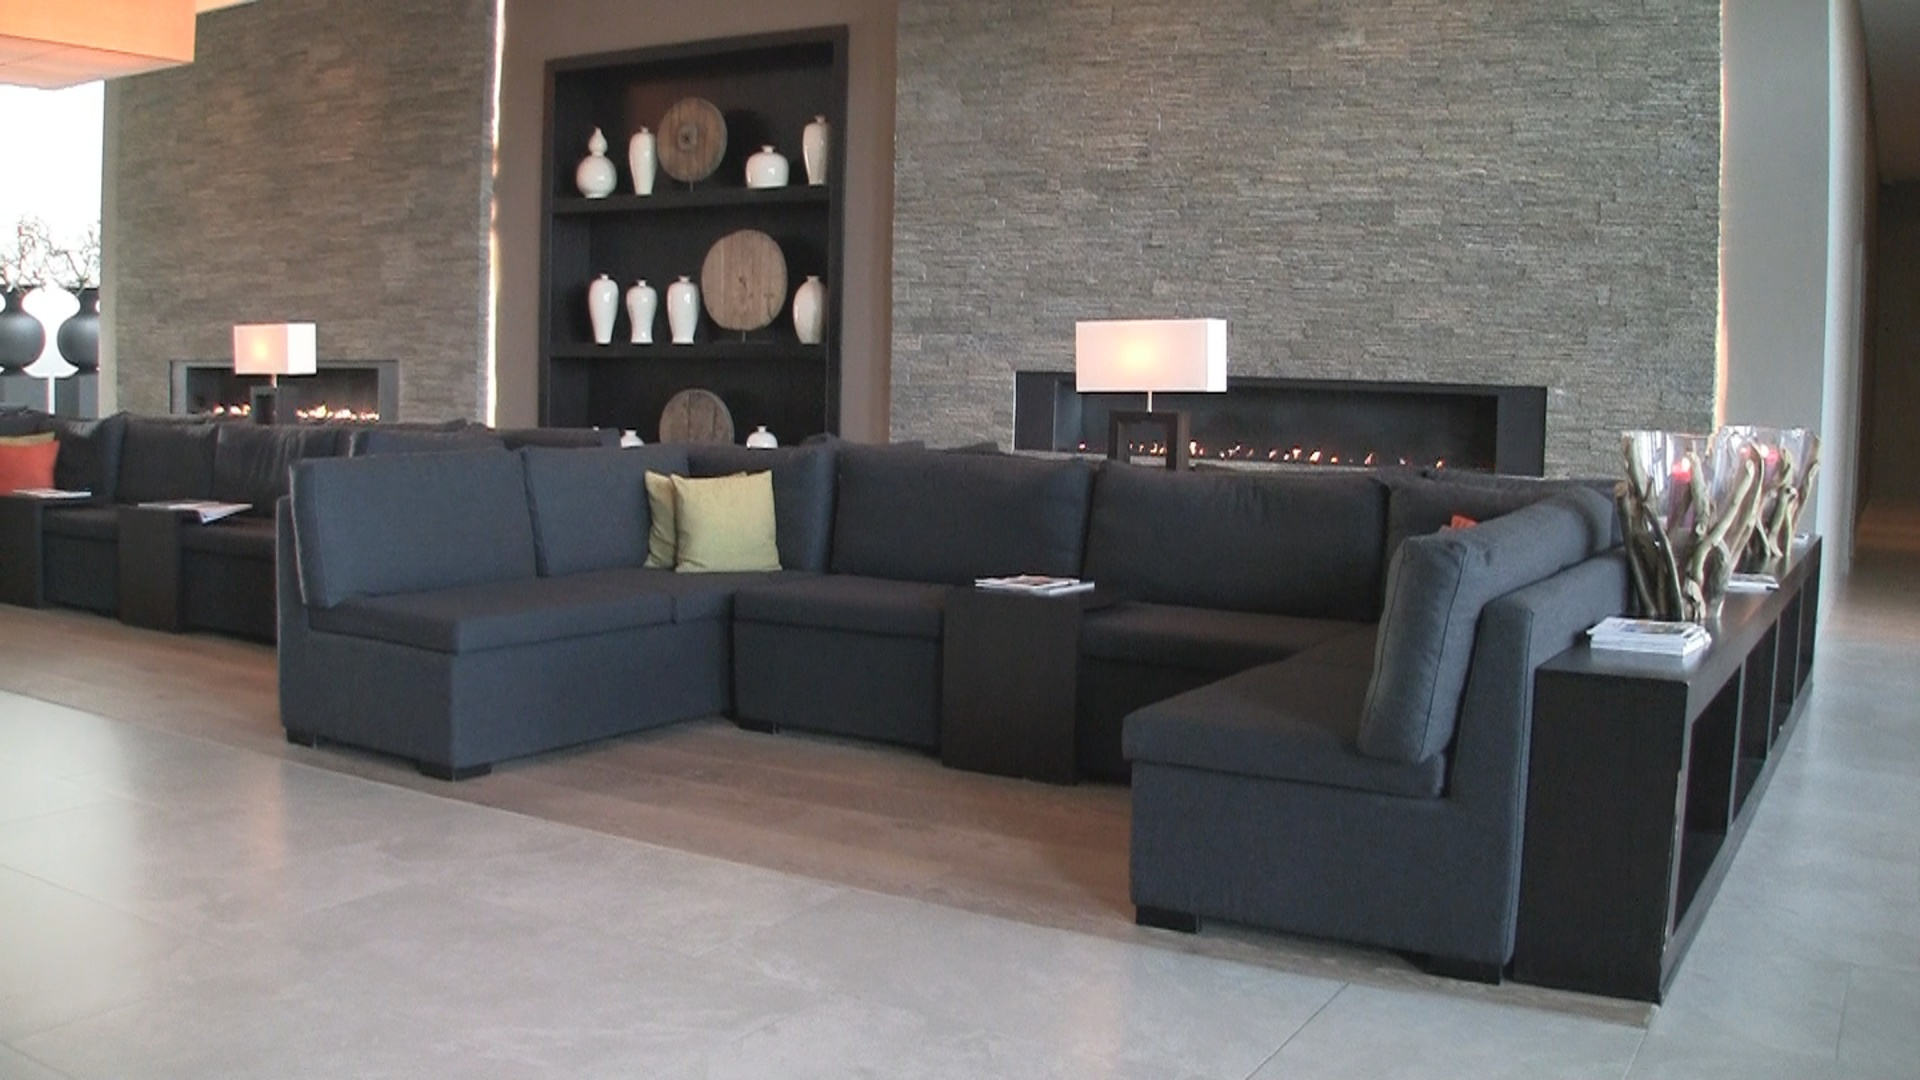 Lobby sofas at Airporthotel Dusseldorf.